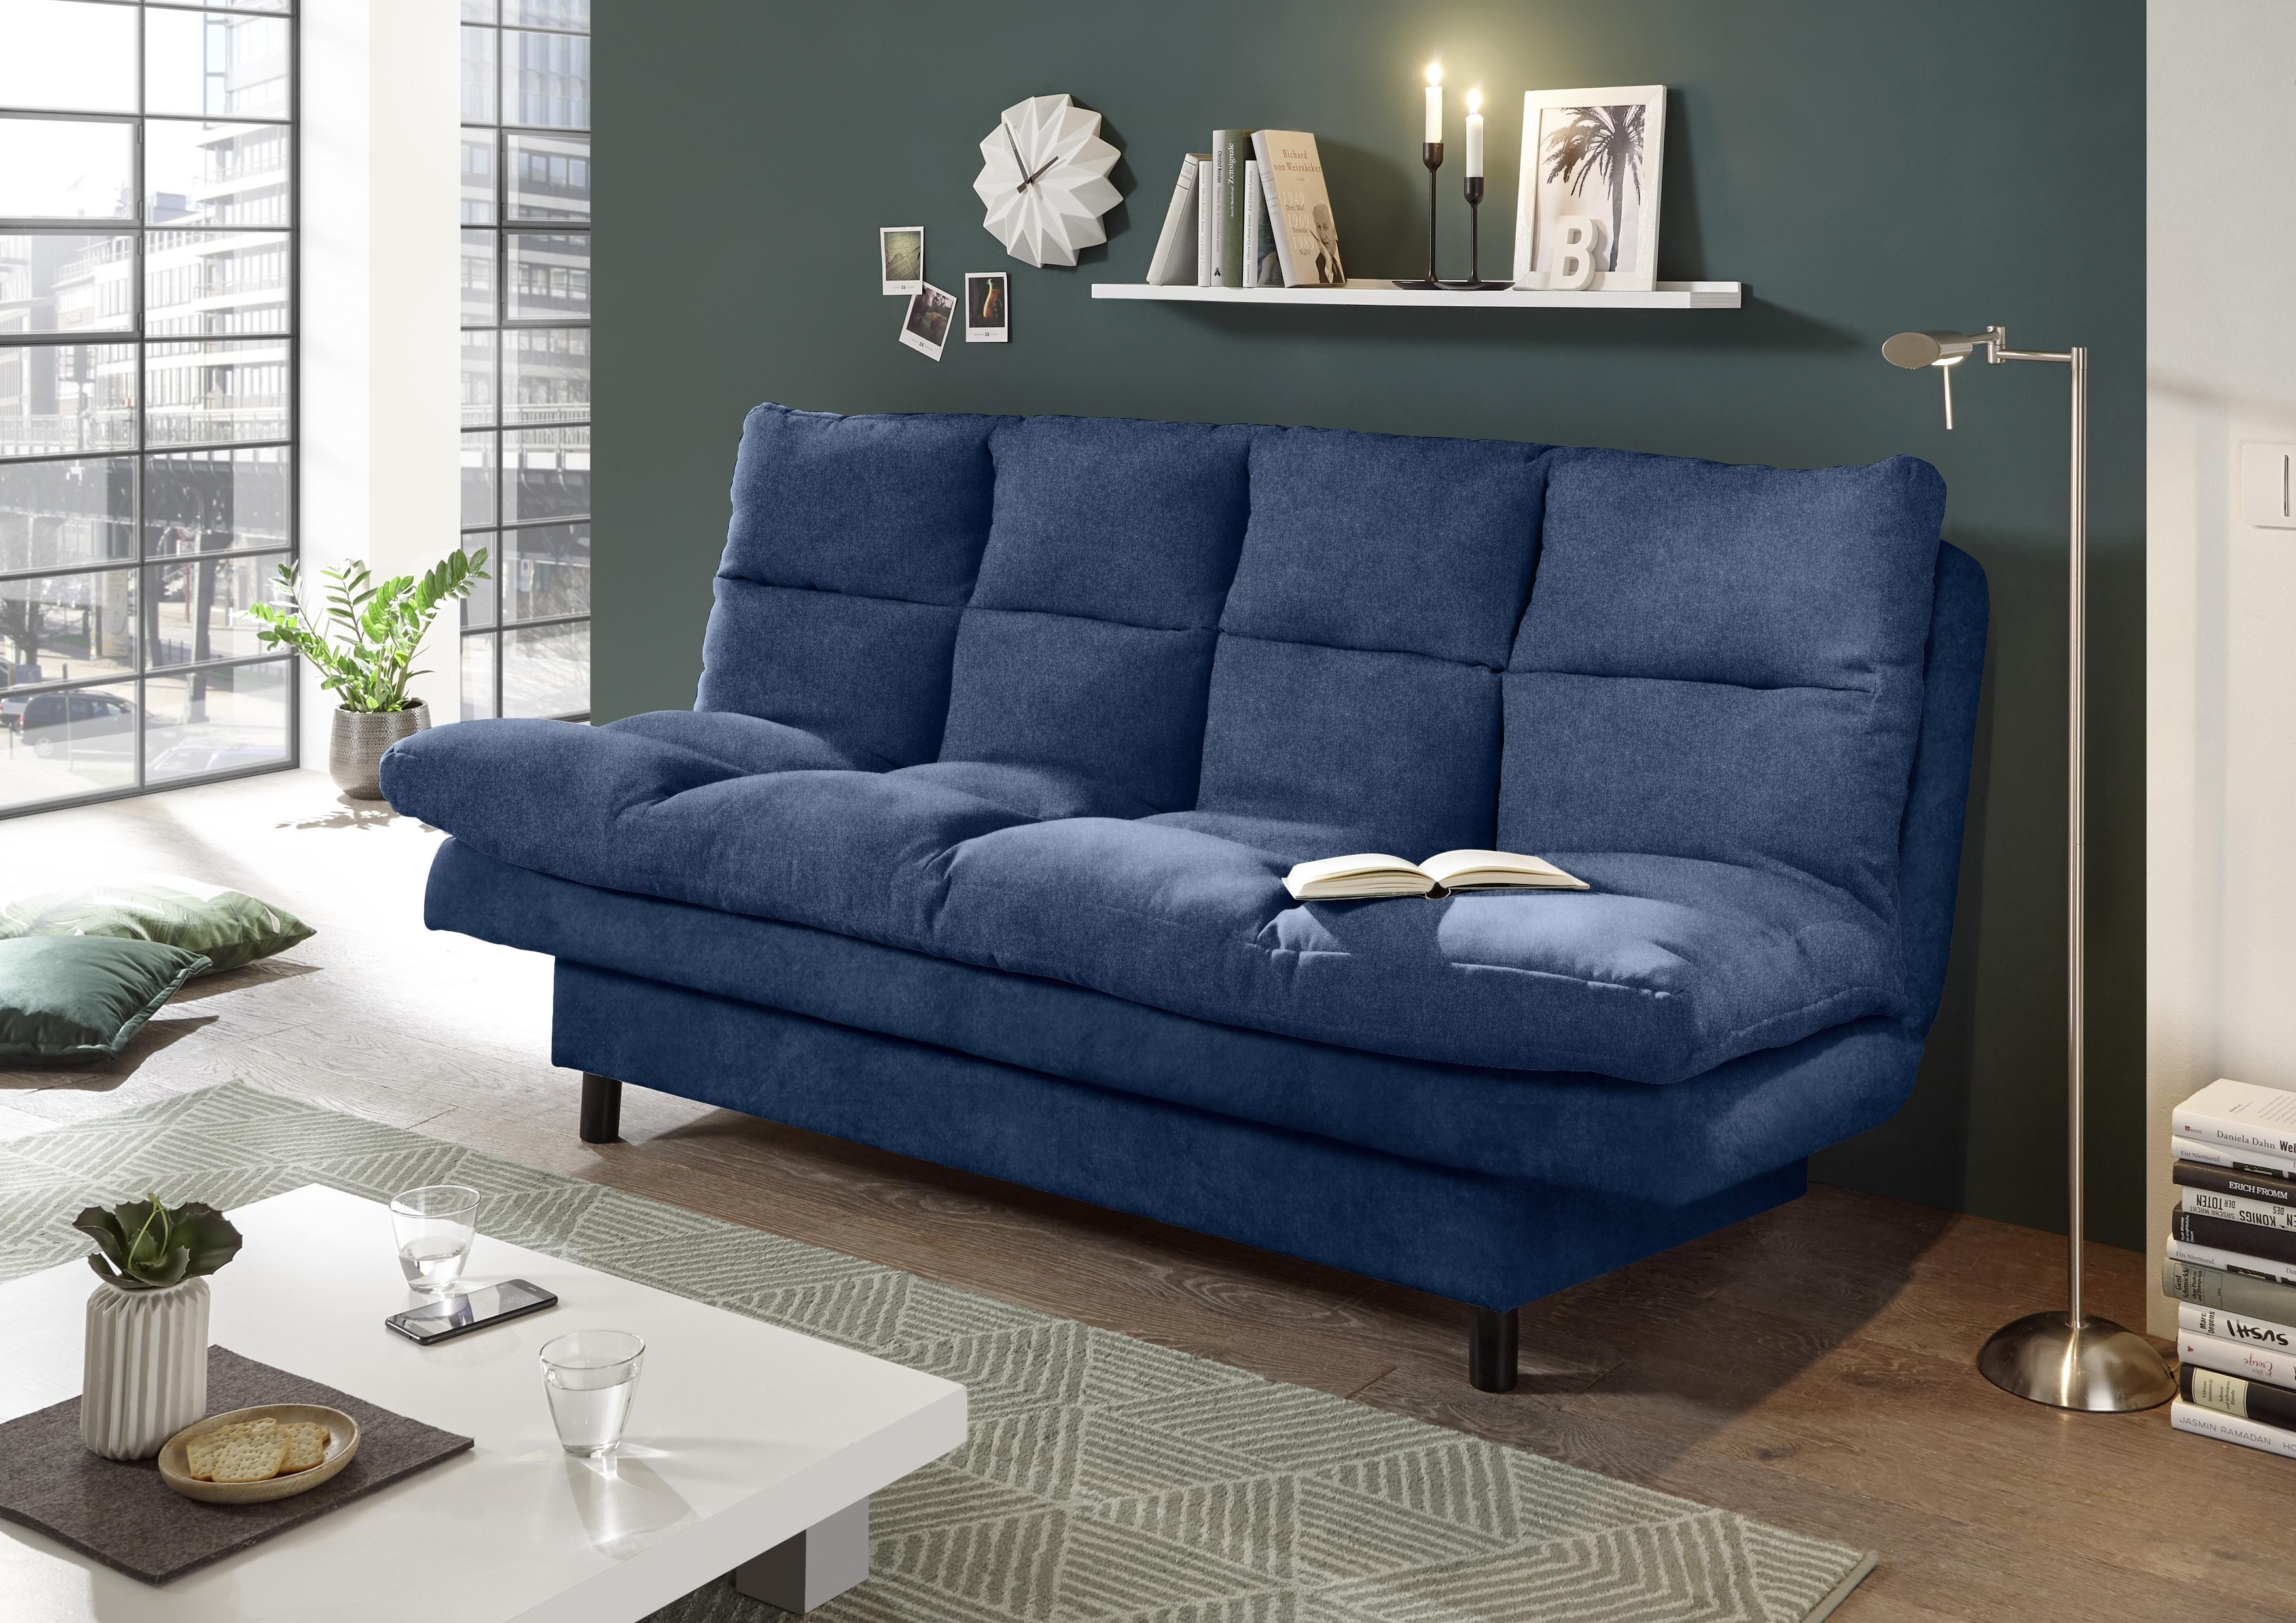 Canapea extensibila tapitata cu stofa, 3 locuri Lotta 2 Bleumarin, l190xA95xH85 cm poza